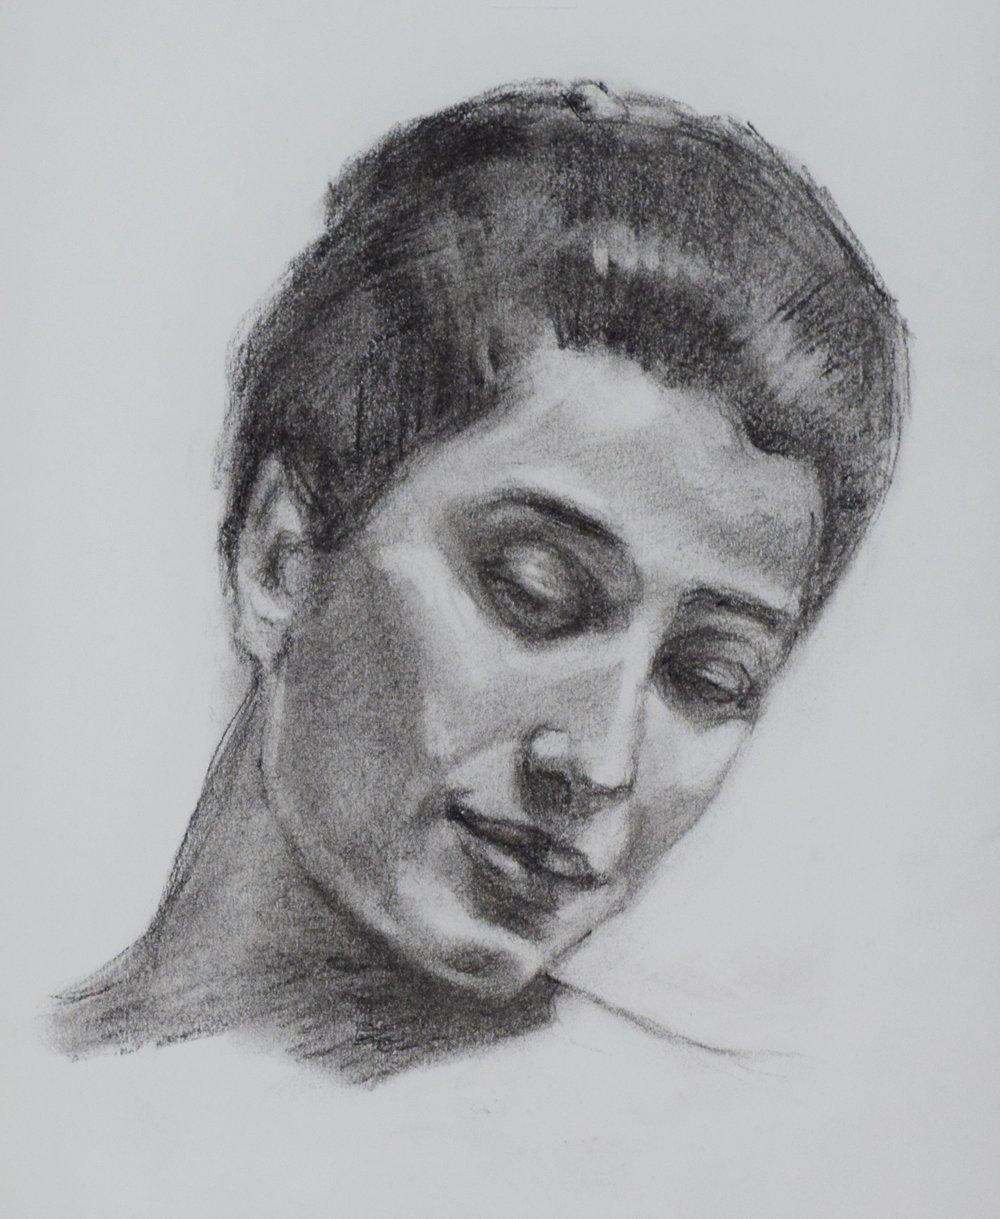 2018.Sketch.20.LR.JPG